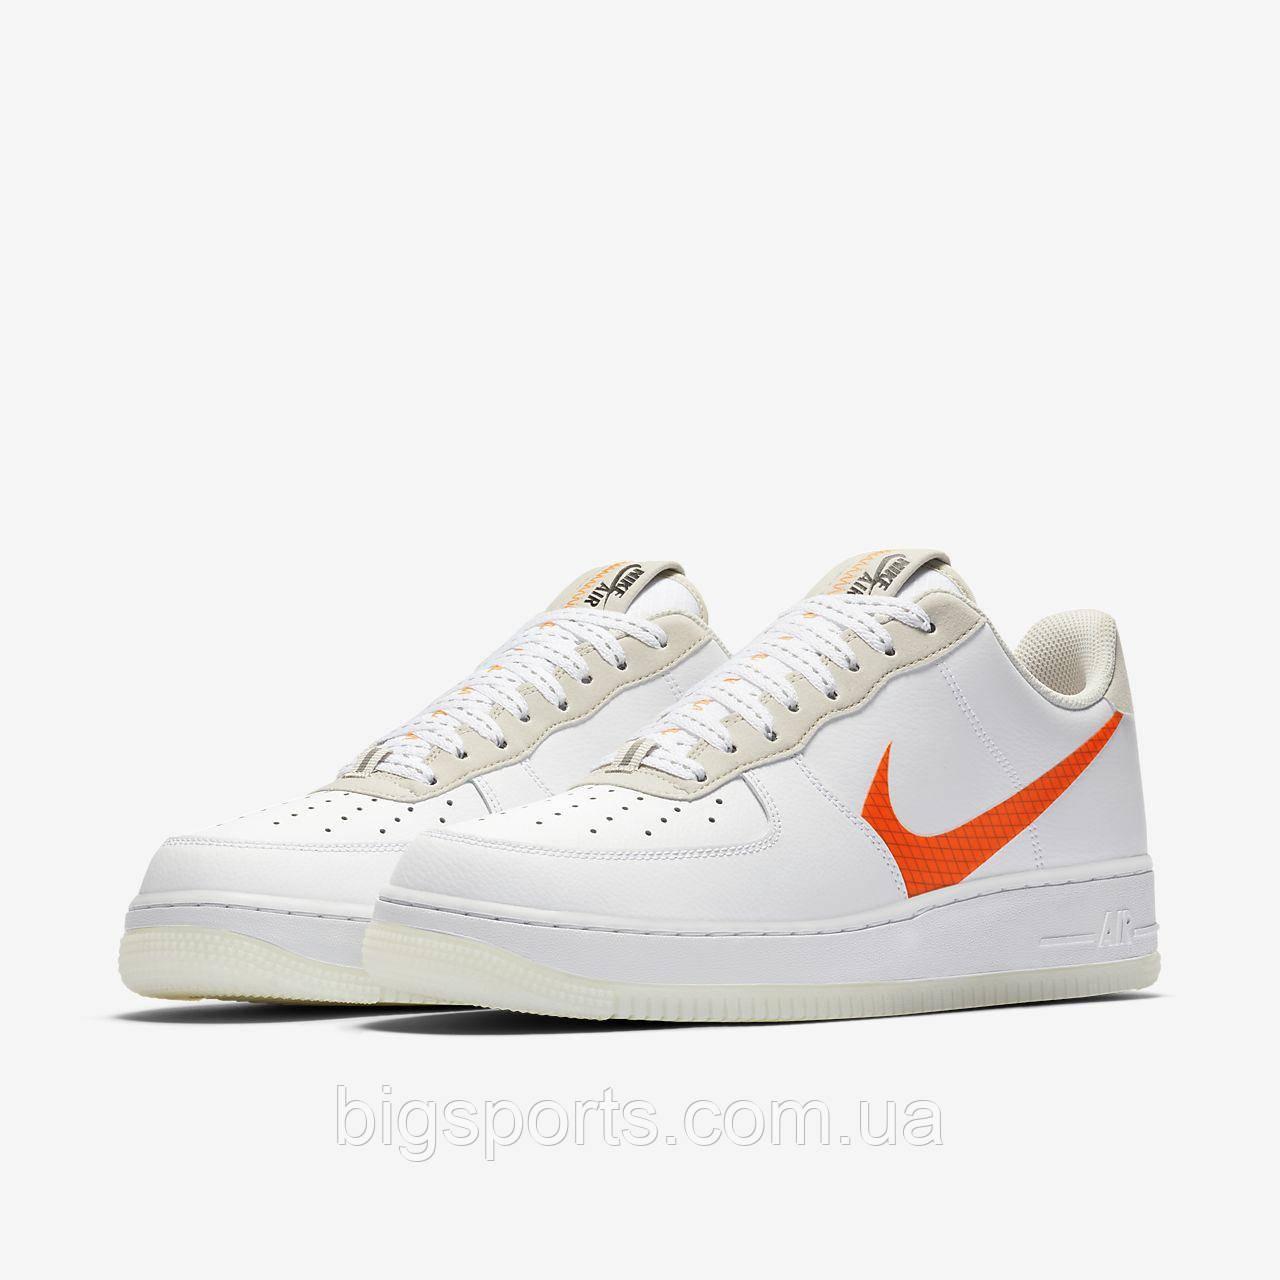 Кросівки чоловік. Nike Air Force 1 07 Lv8 3 (арт. CD0888-100)